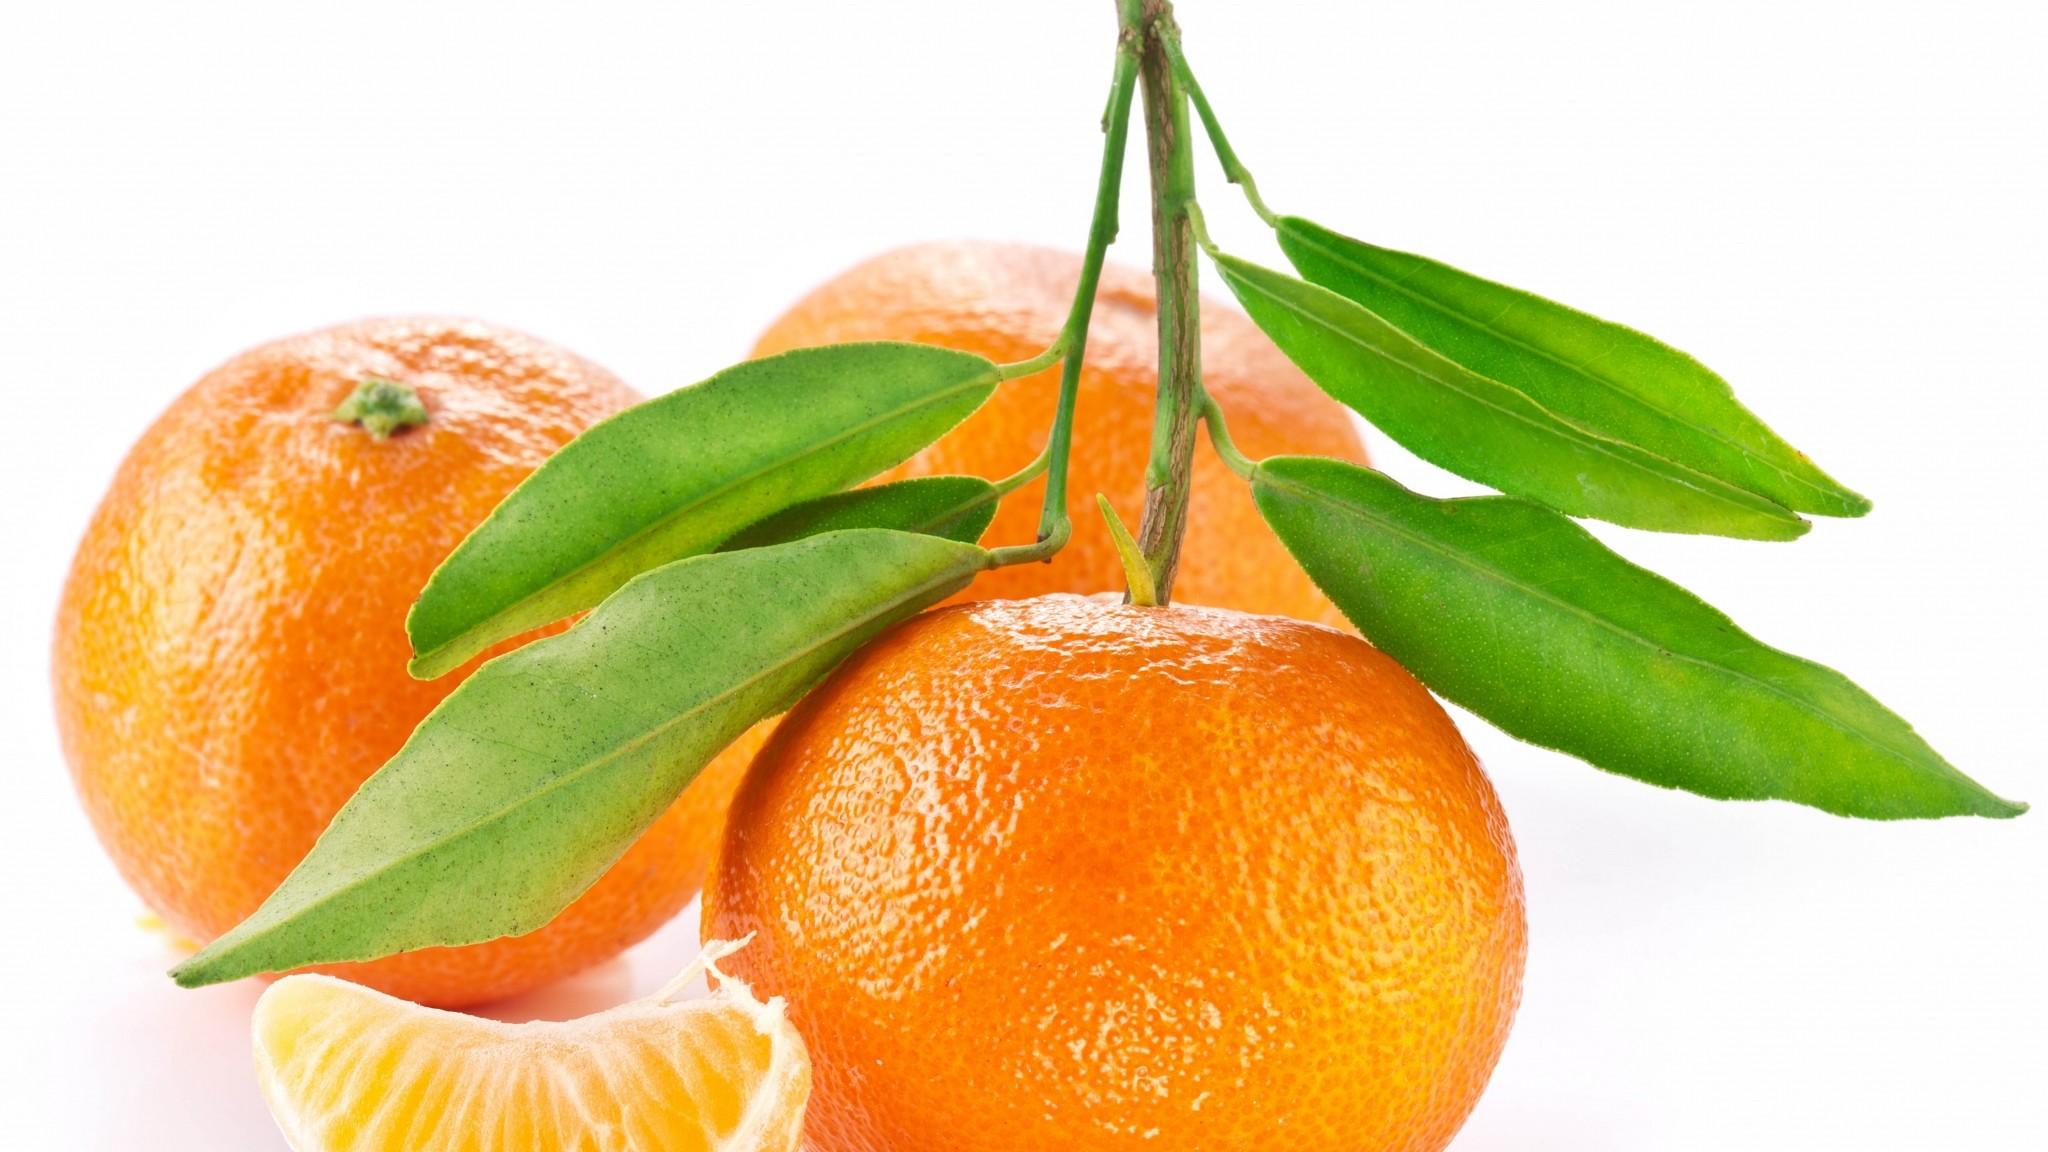 Preview wallpaper orange, fruit, white background, leaf 2048×1152